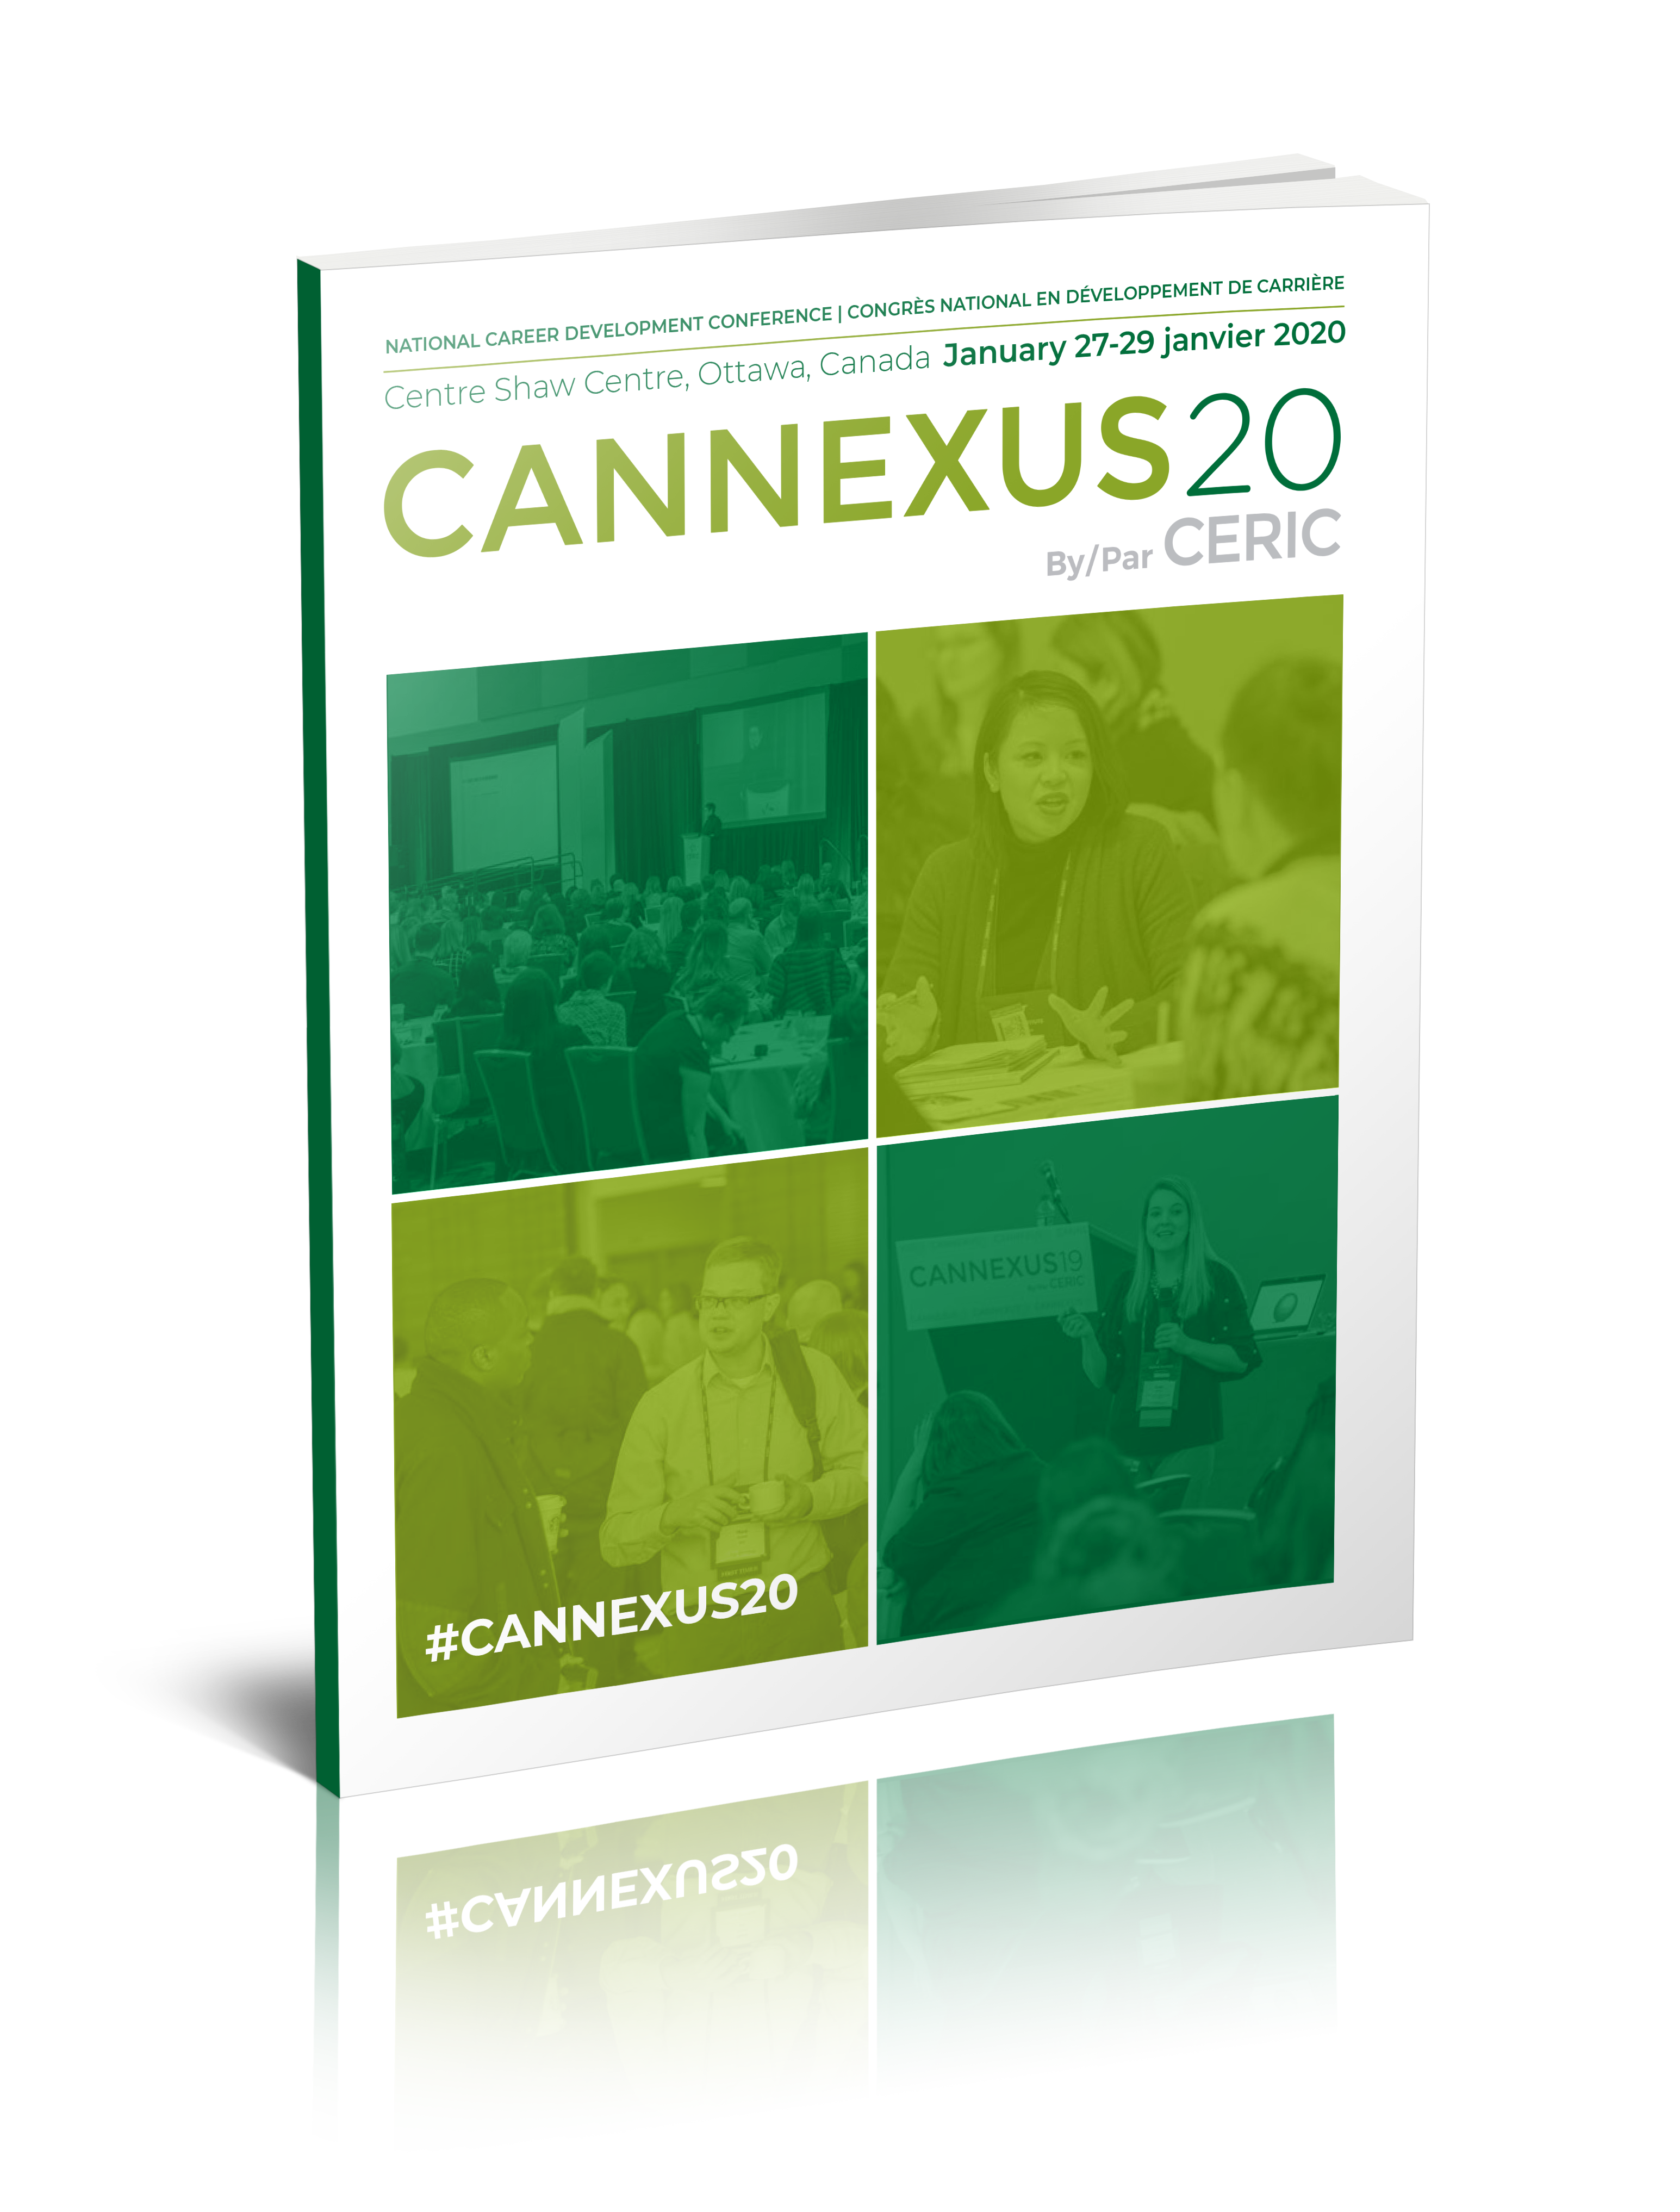 cannexus20 final programme